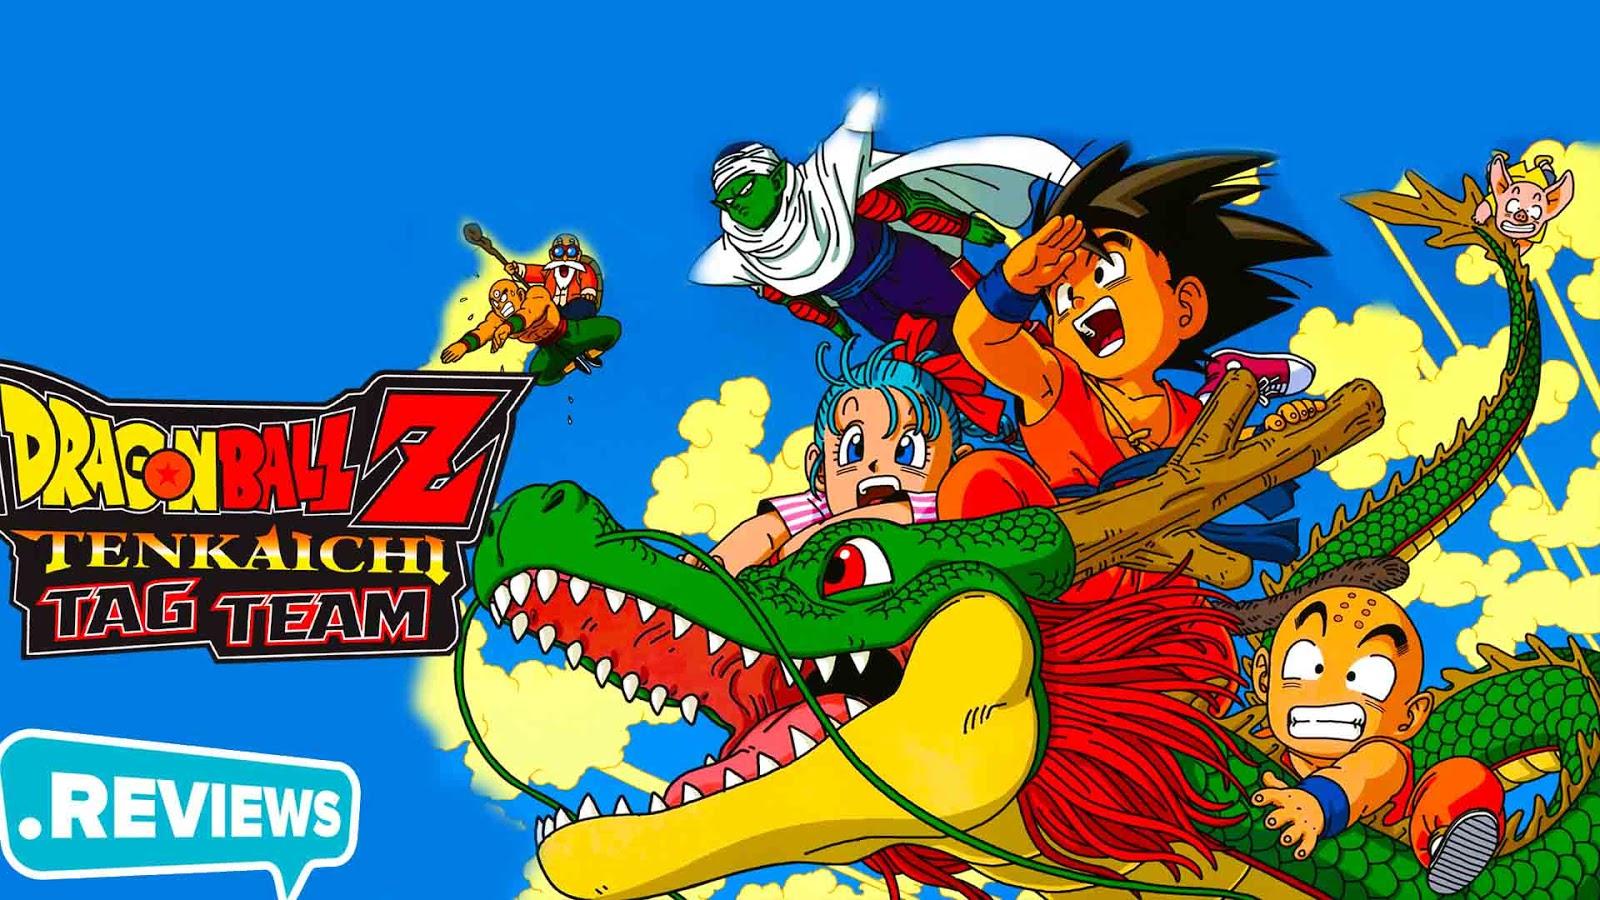 Download game Dragon Ball Z Tenkaichi Tag Team